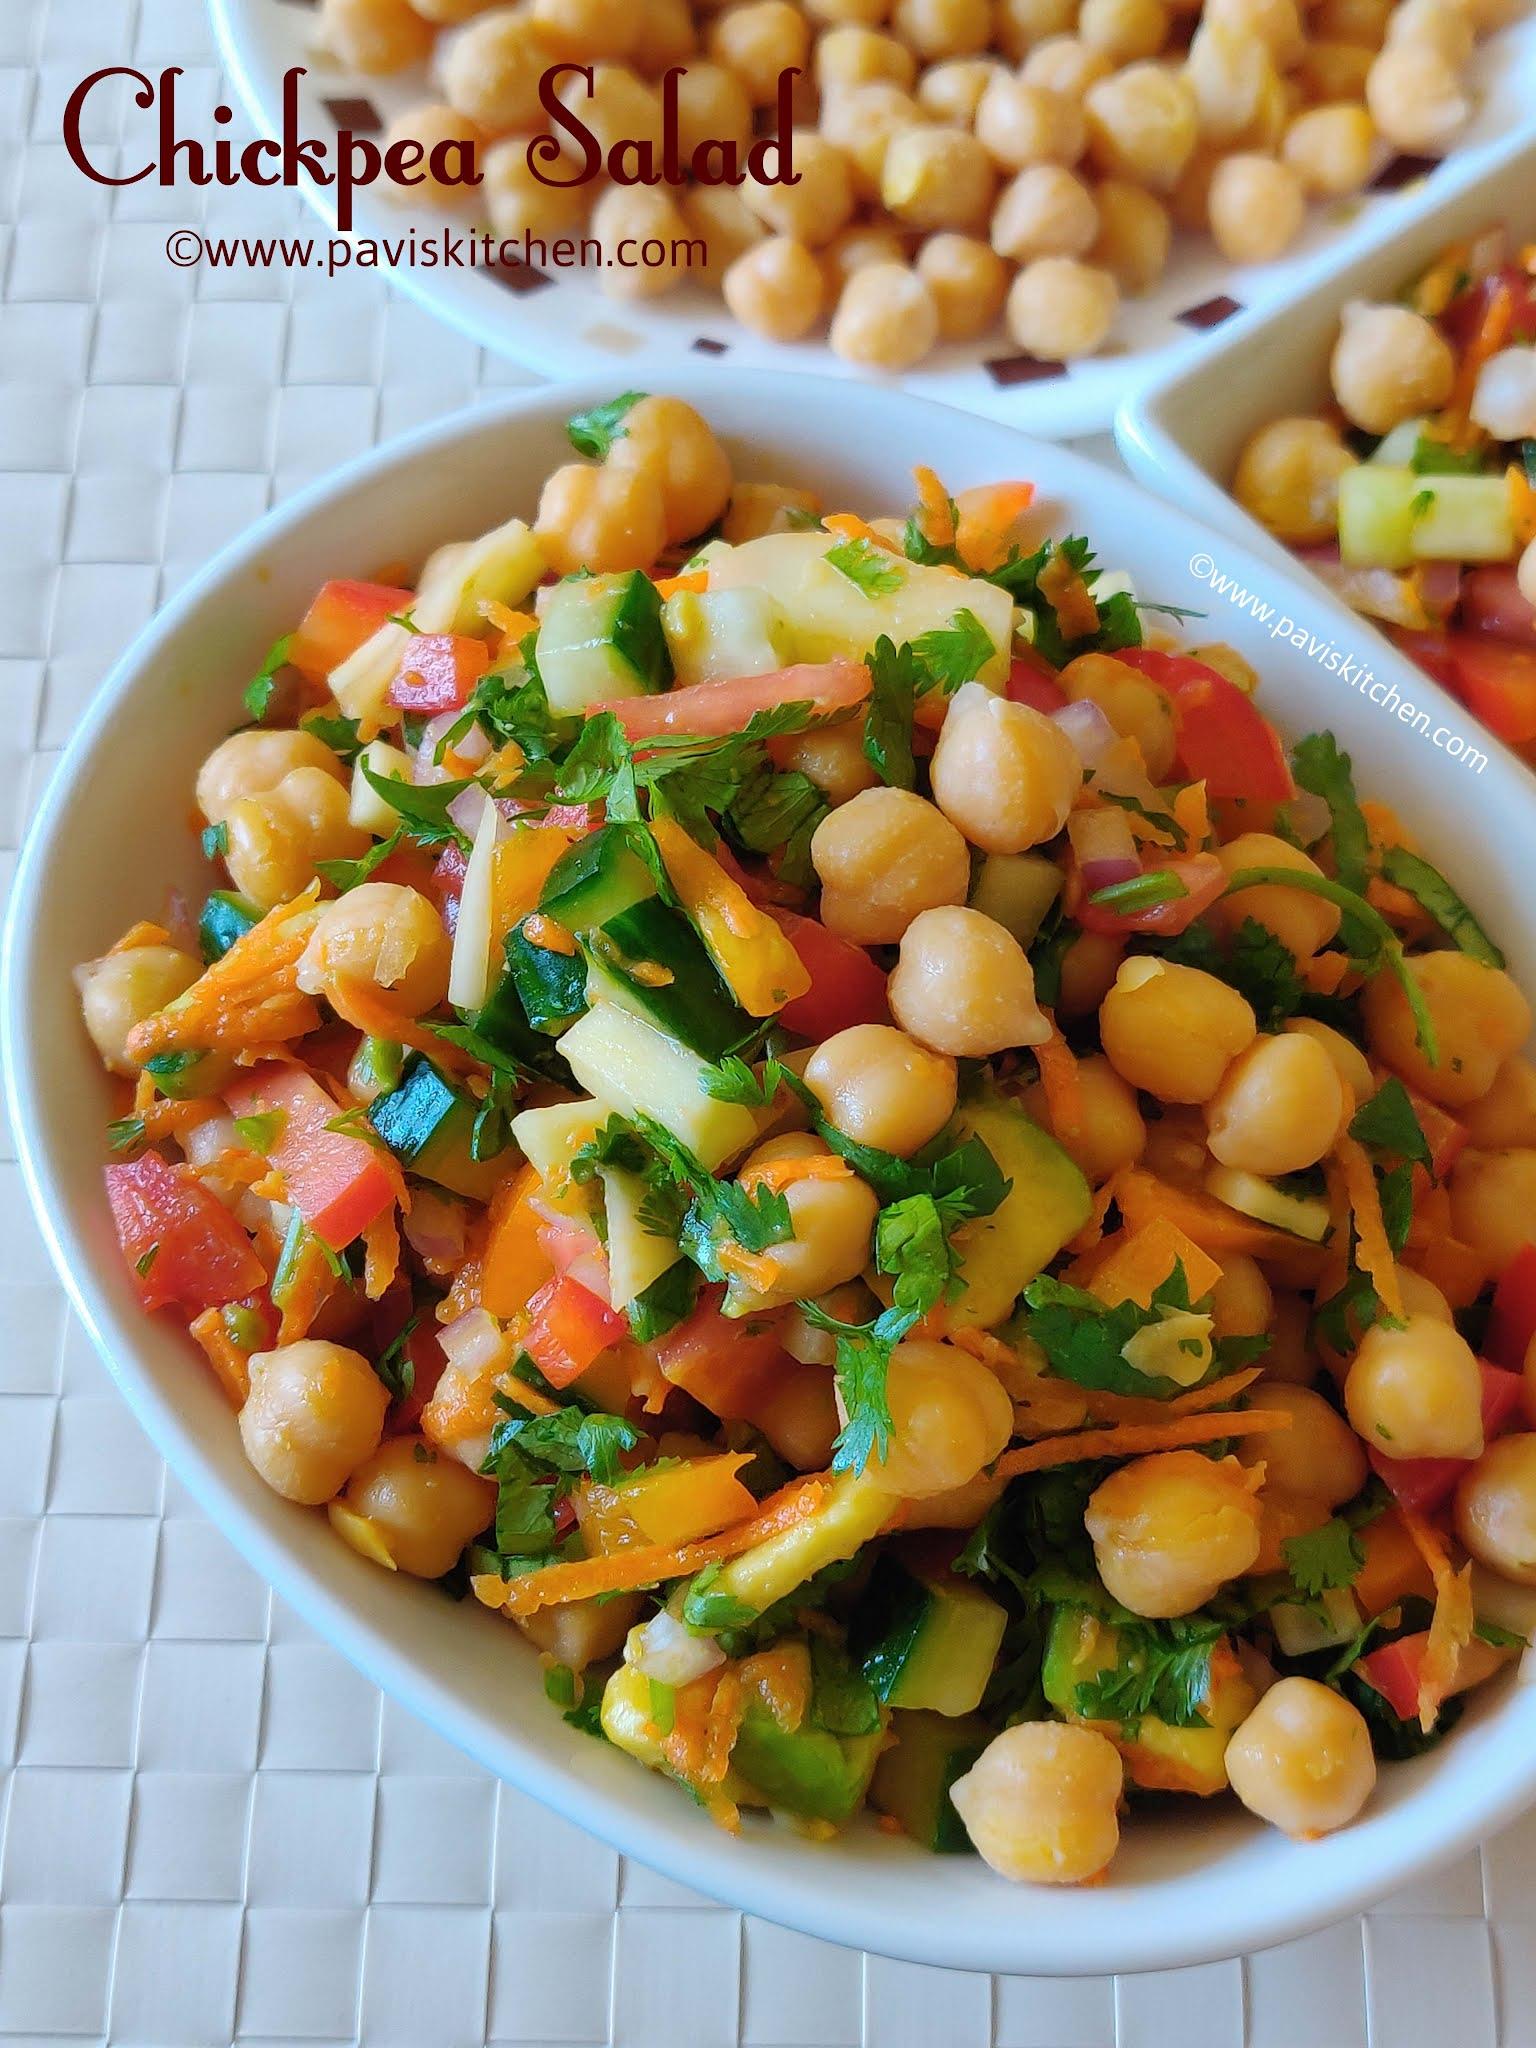 Spicy chickpea salad recipe | Indian chana salad | garbanzo salad recipe | Kondakadalai salad